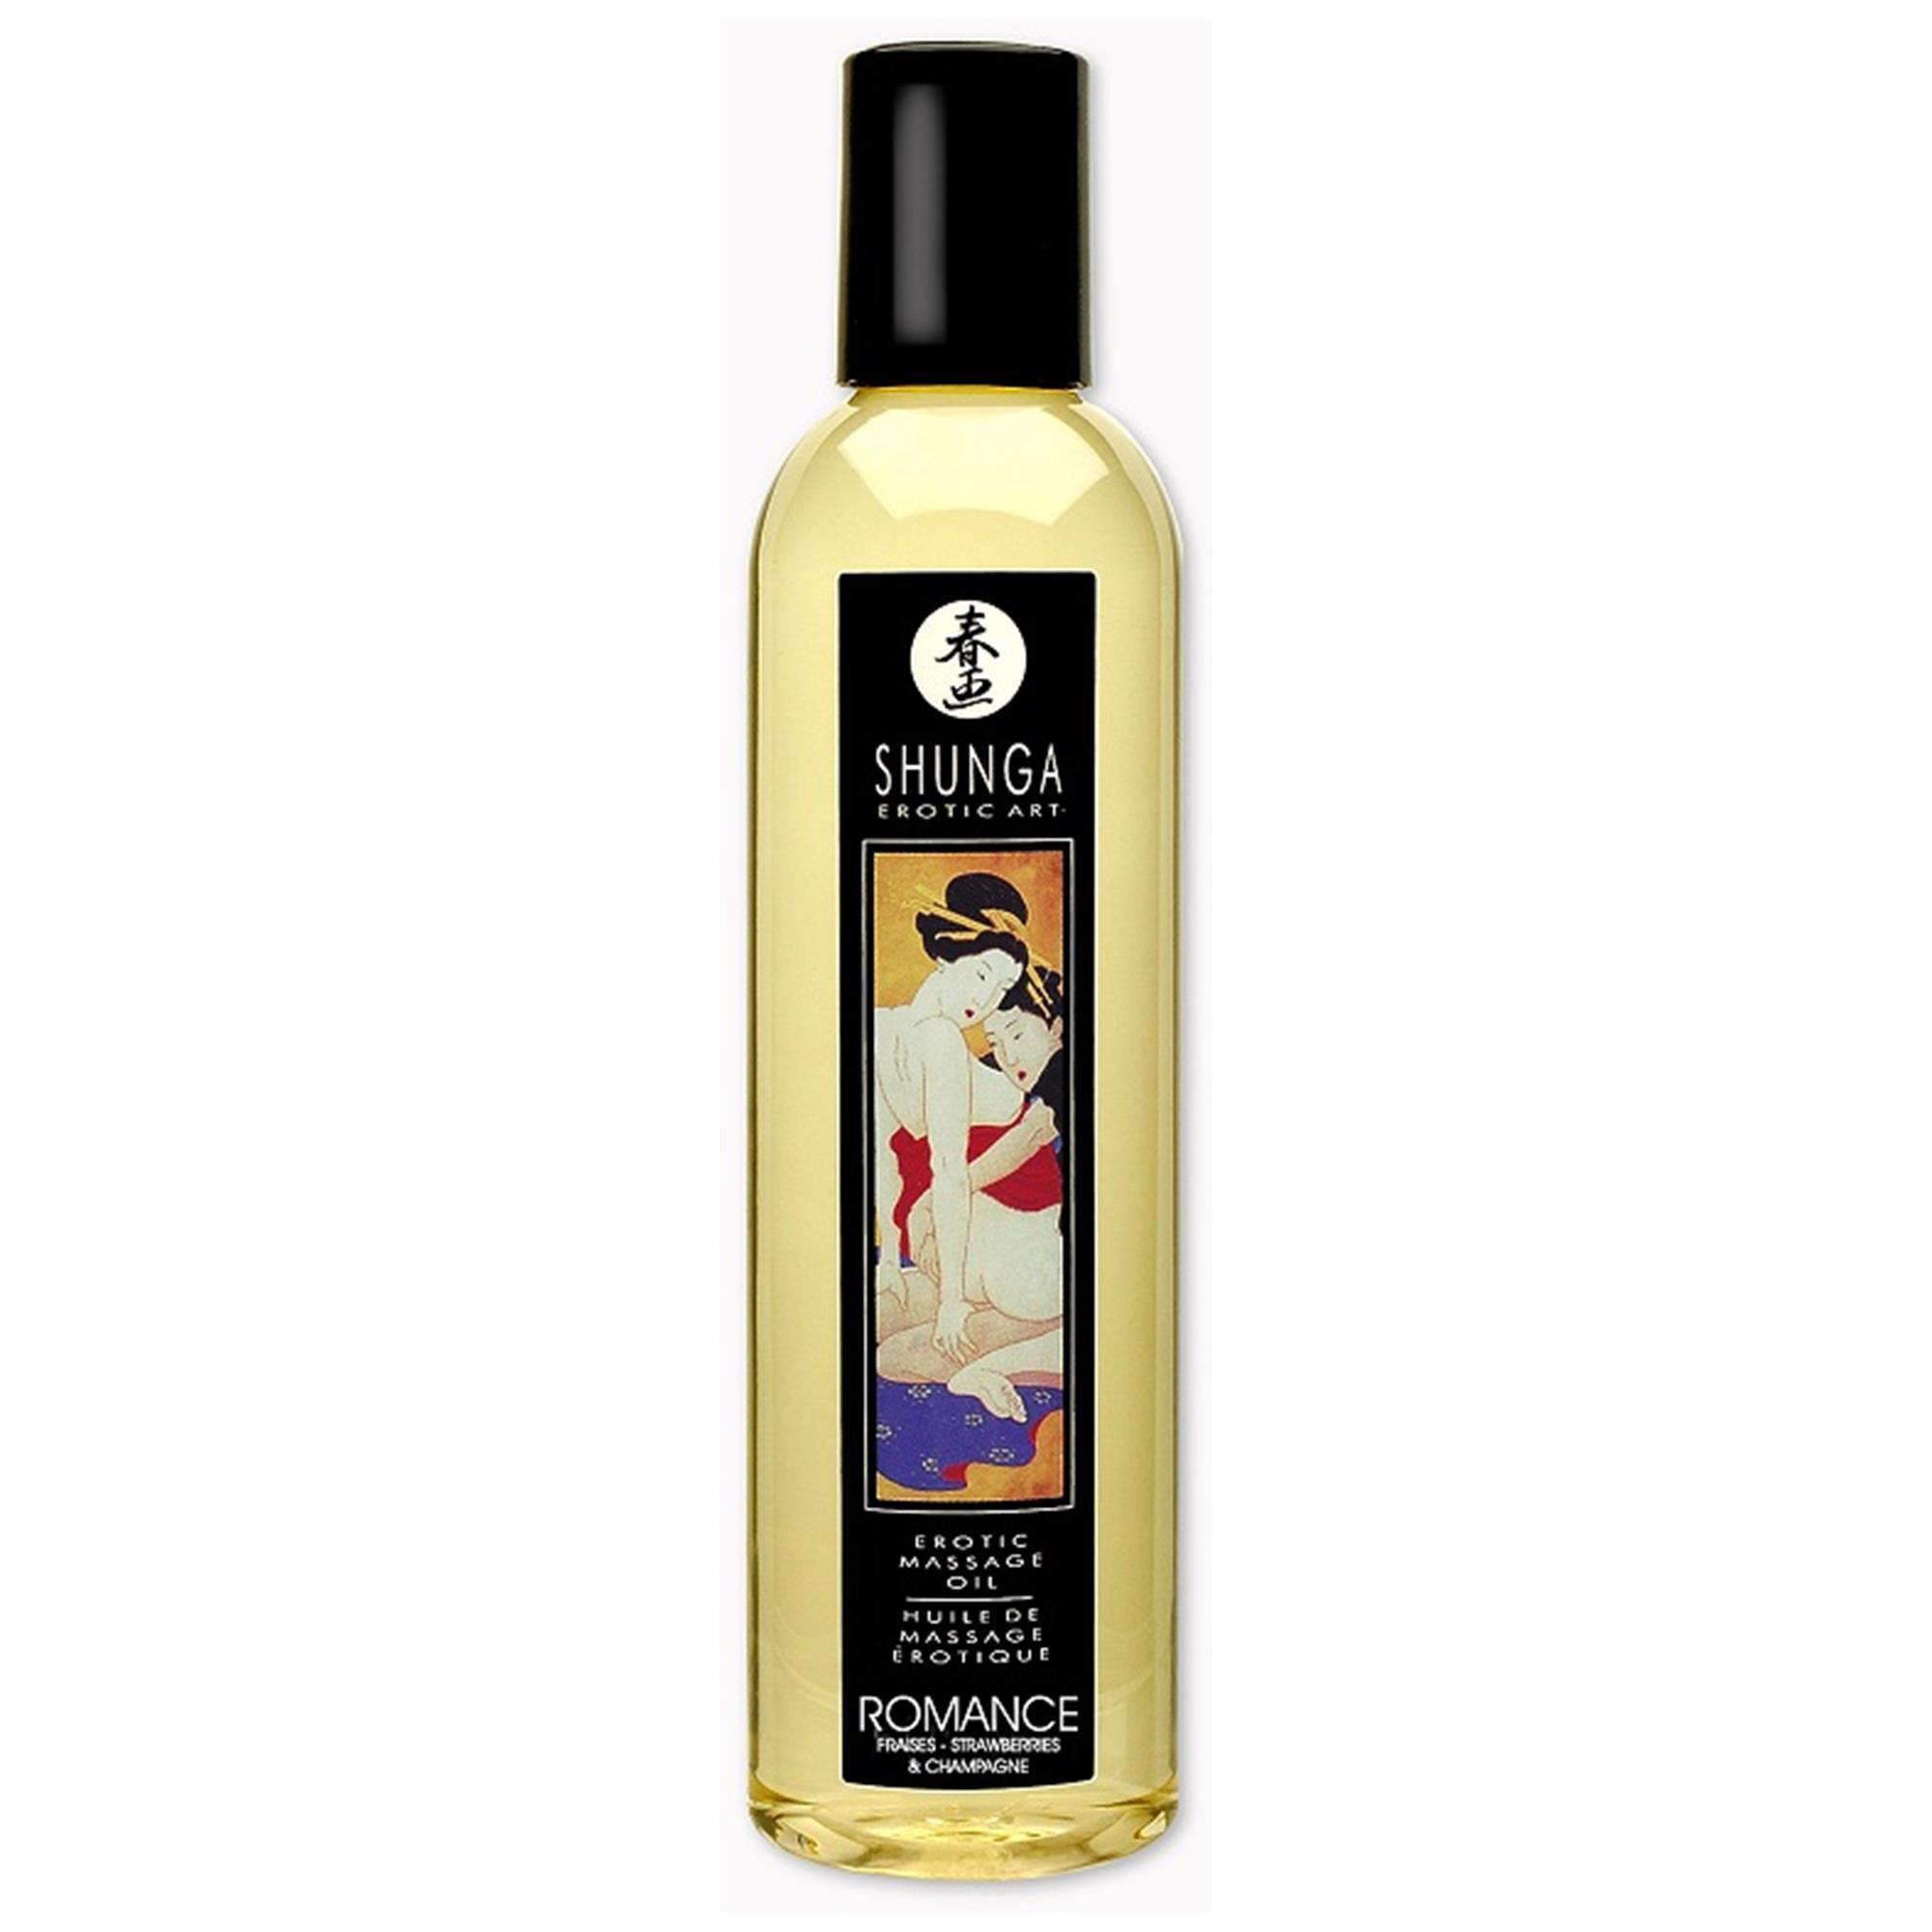 Massage Oil Strawberry Wine - Romance | Apotek, Massage, Massageolja | Intimast.se - Sexleksaker